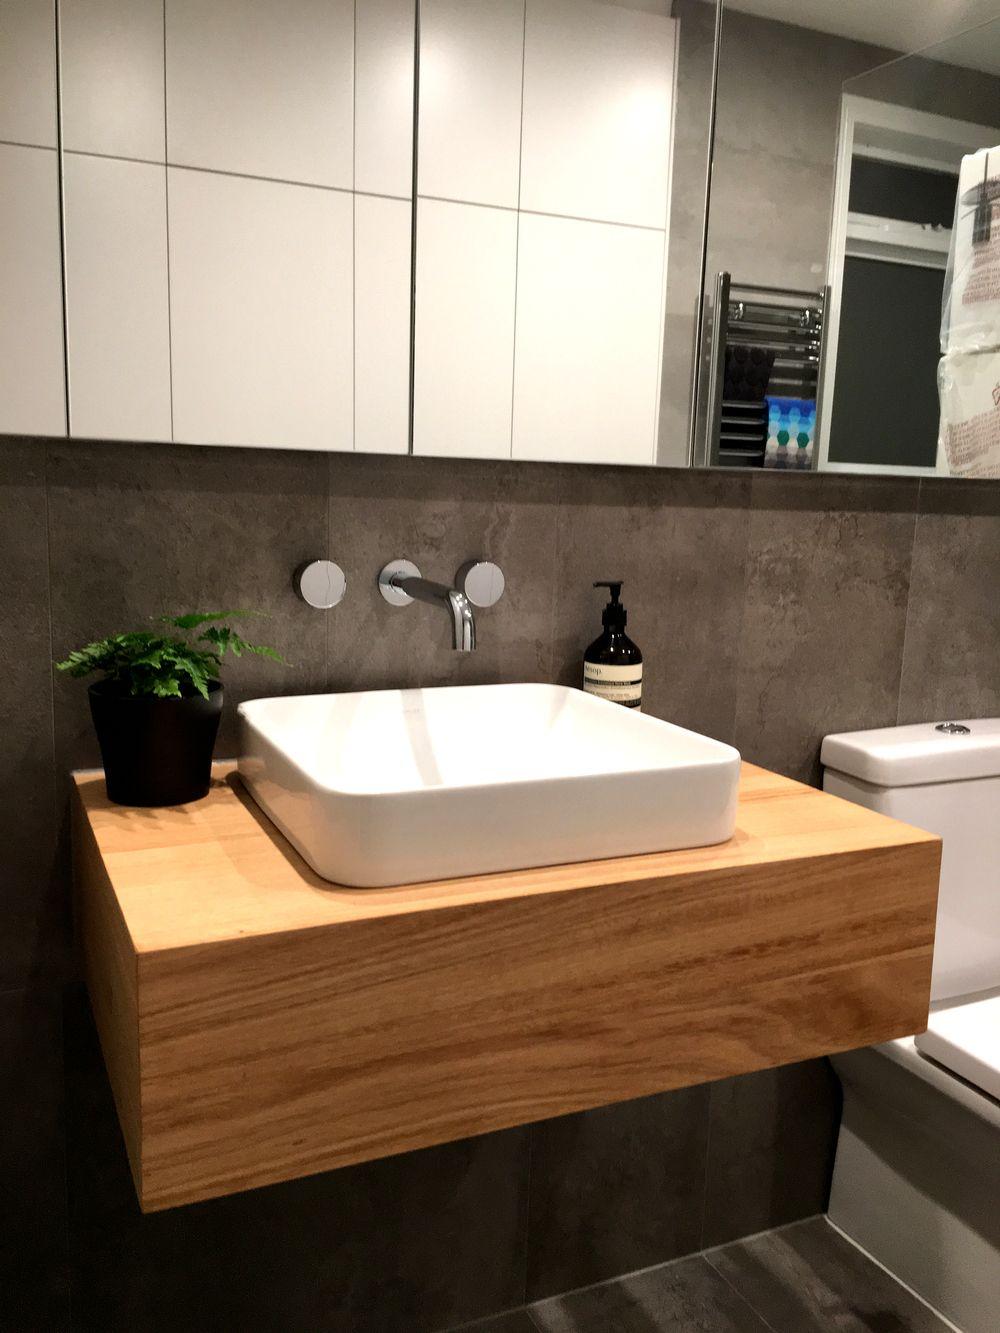 Custom Timber Vanity Bringing Warmth To Your Bathroom Bathroom